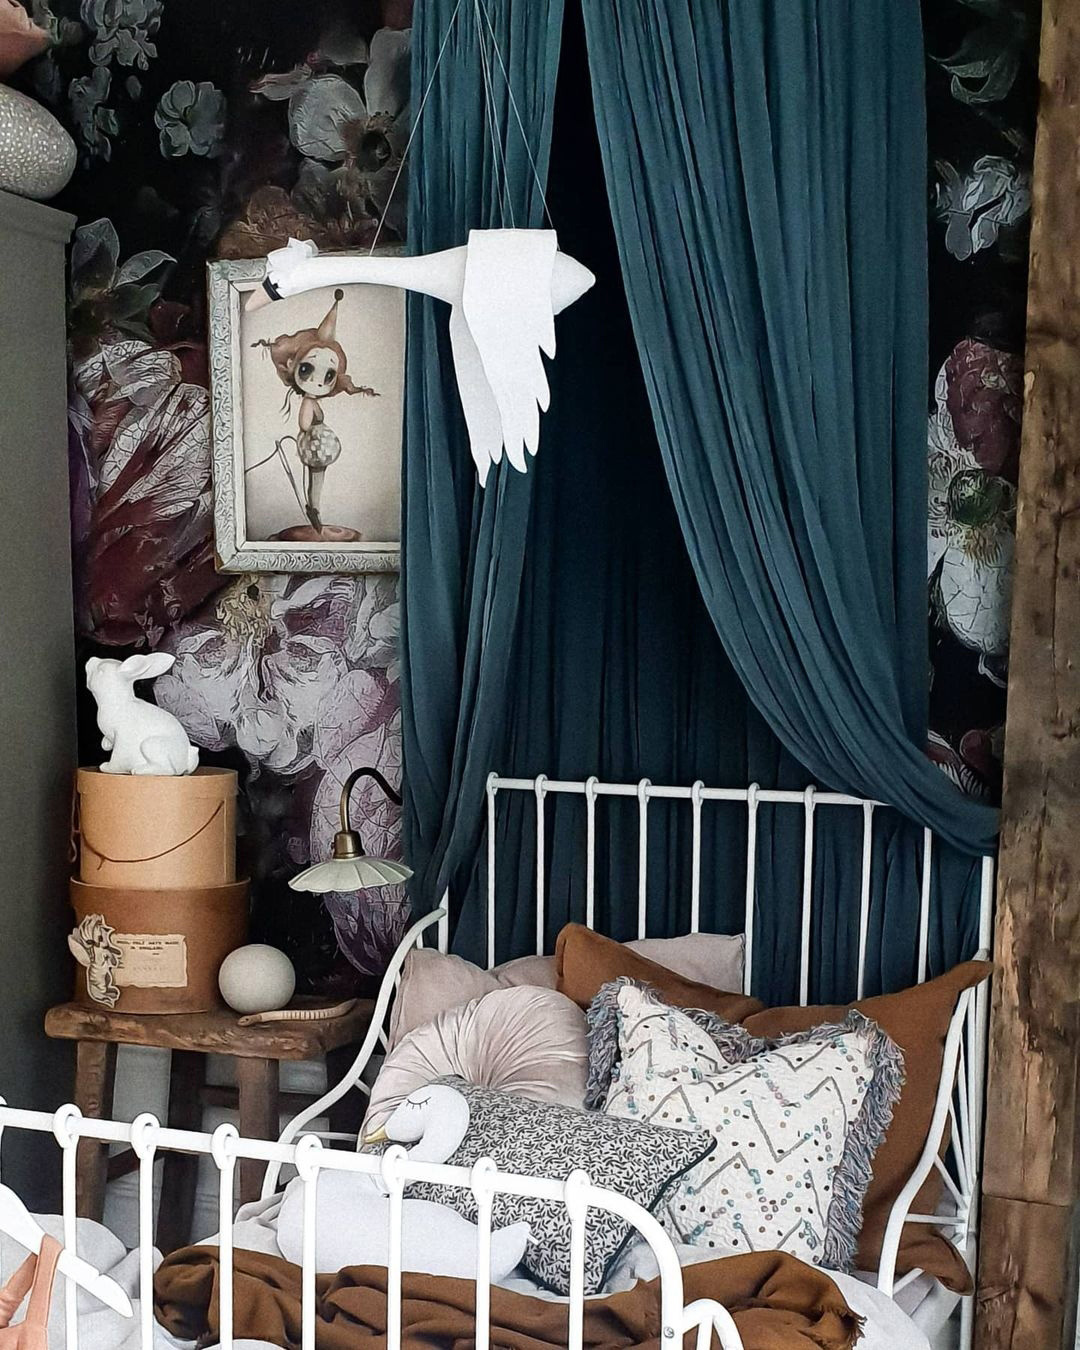 swan mobile for nursery or kids' rooms